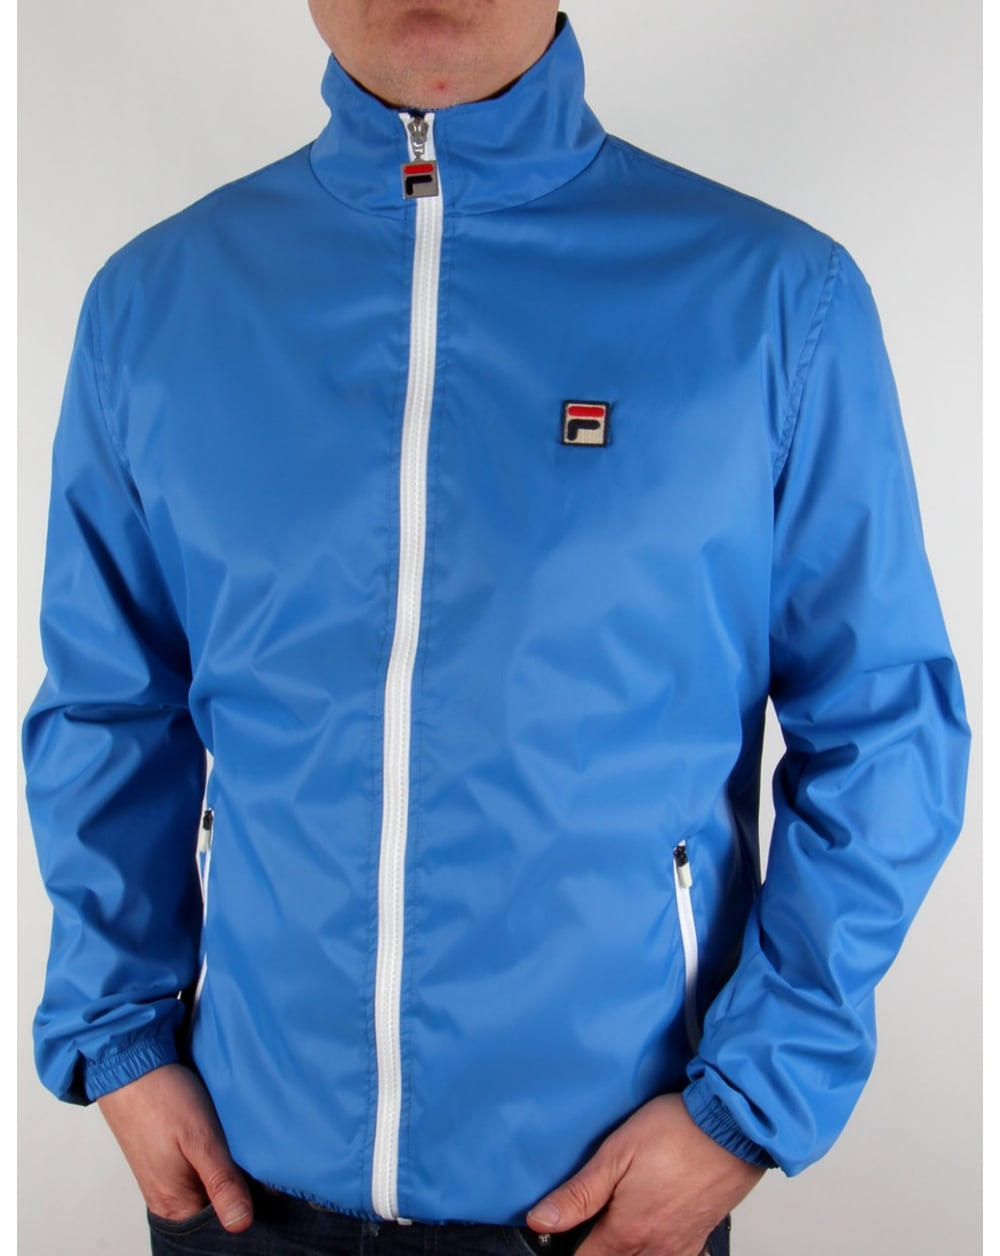 c42aed636a3f Fila Vintage Fila Vintage Quayside Jacket Ocean Blue